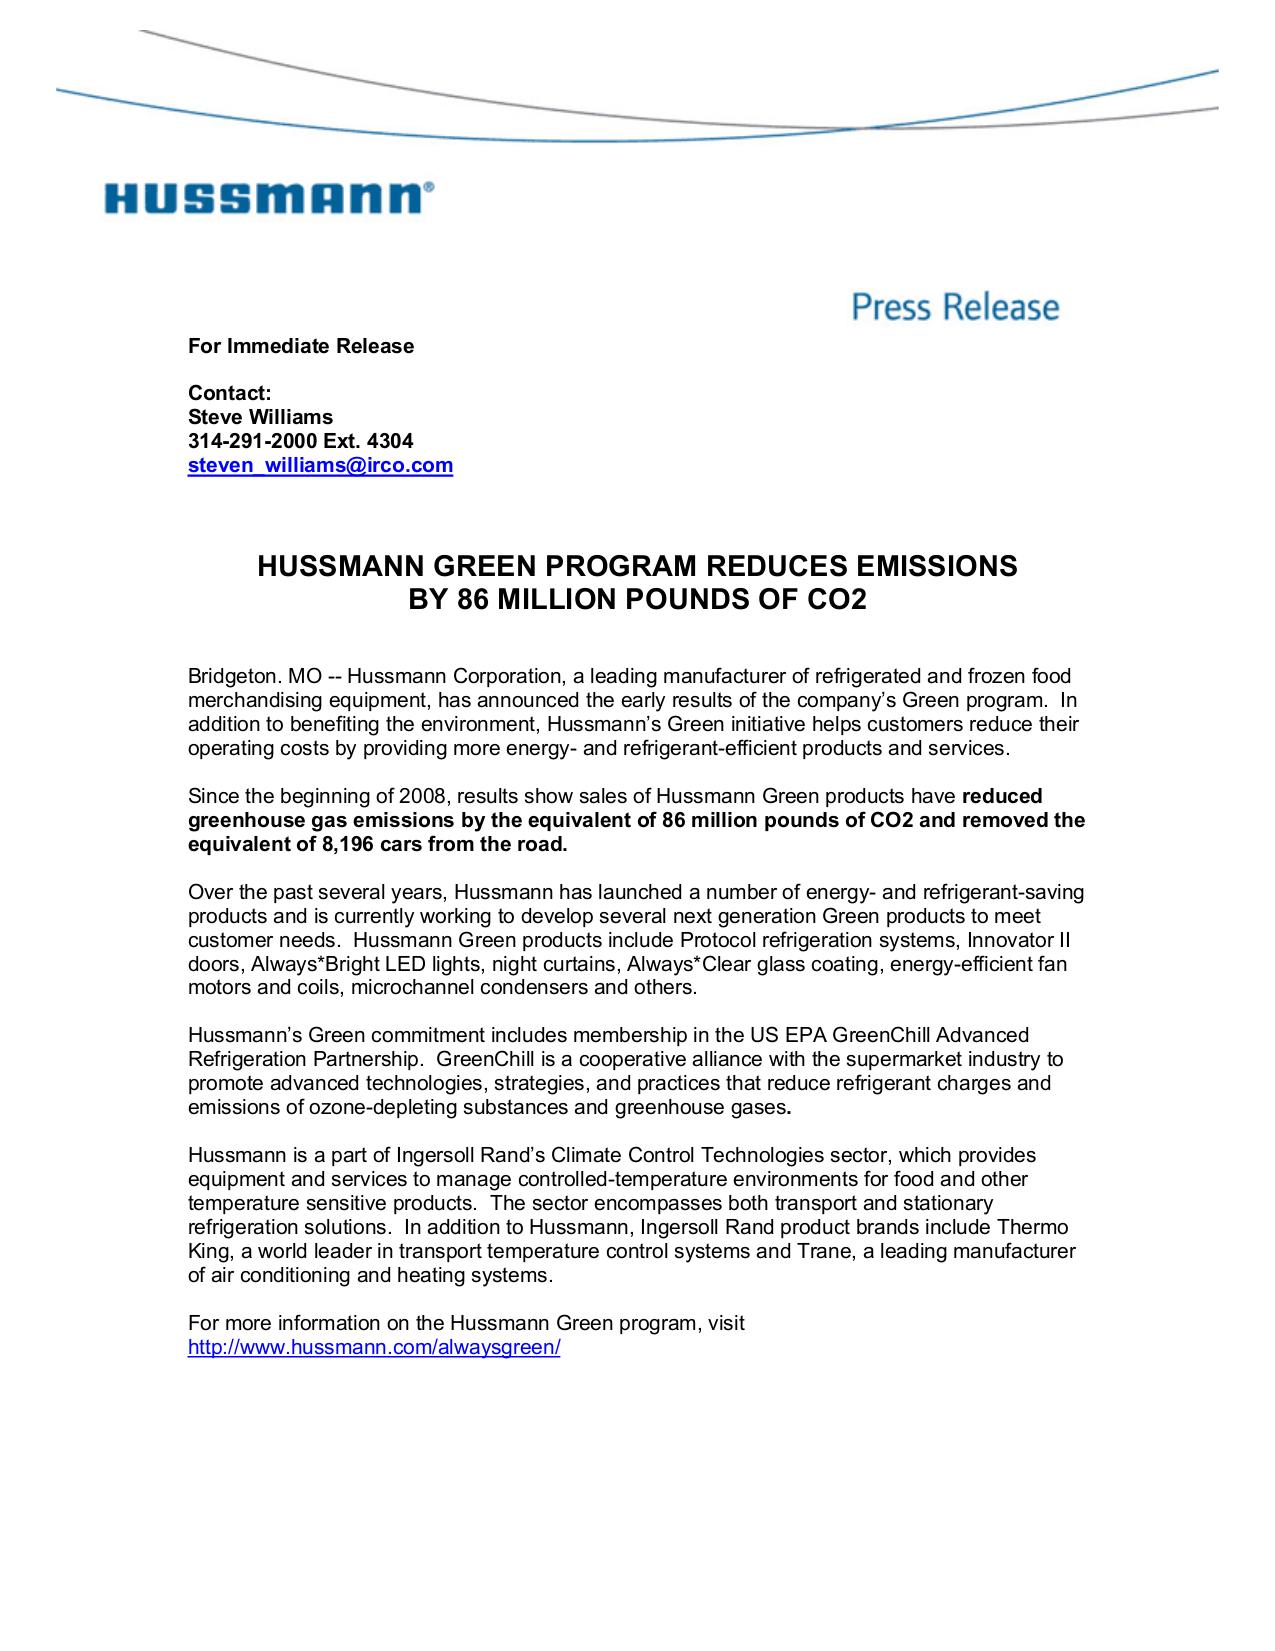 pdf for Hussmann Refrigerator Innovator II manual